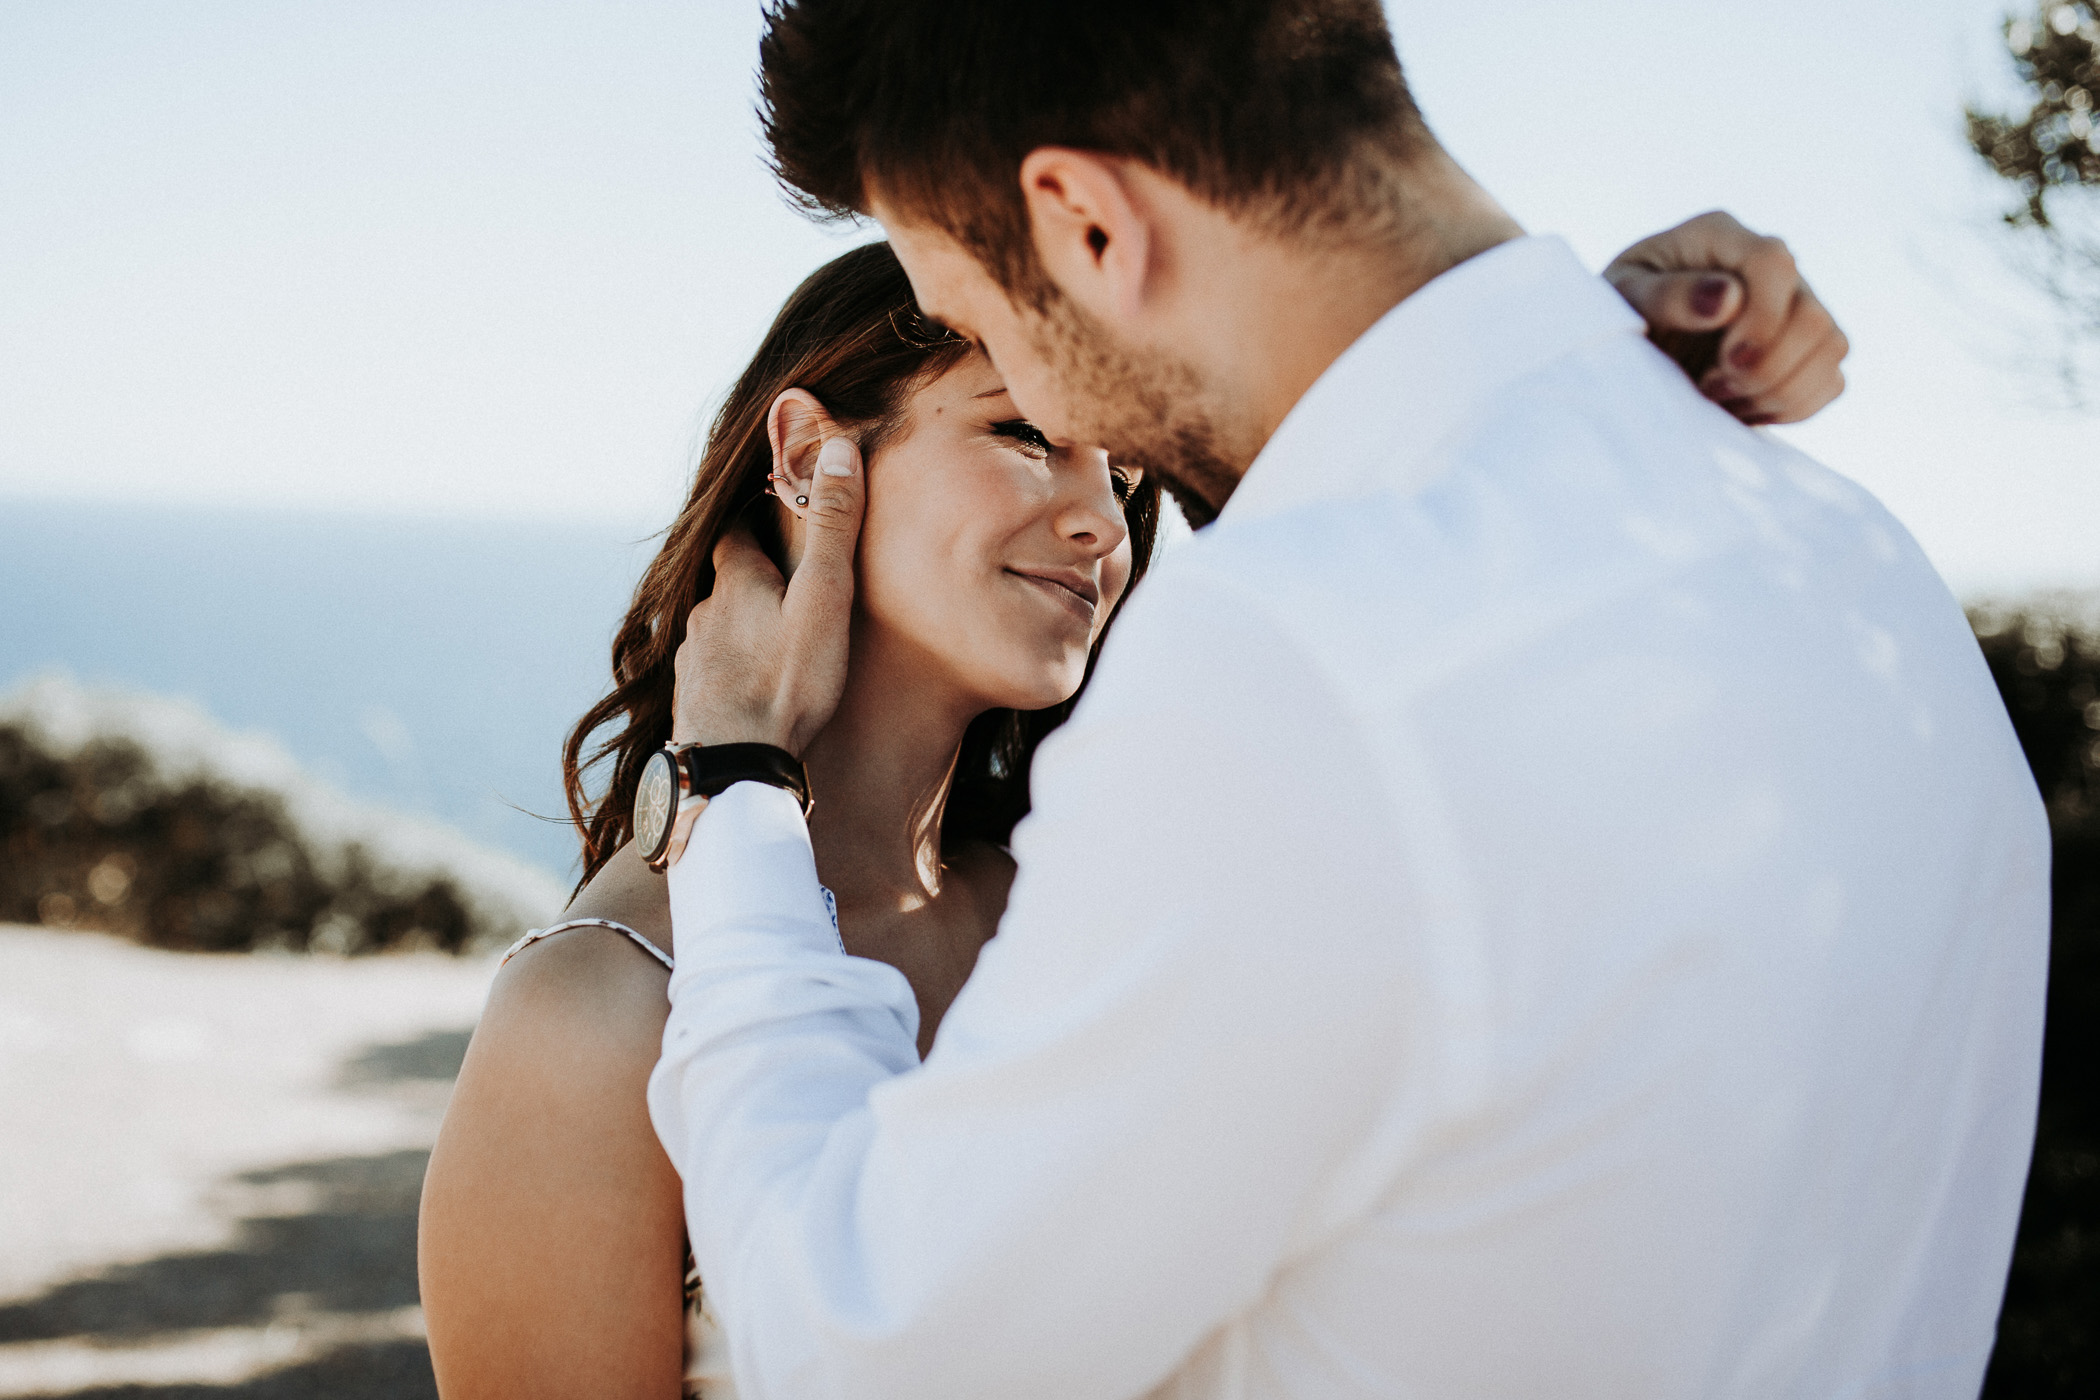 DanielaMarquardtPhotography_wedding_elopement_mallorca_spain_calapi_palma_lauraandtoni_54